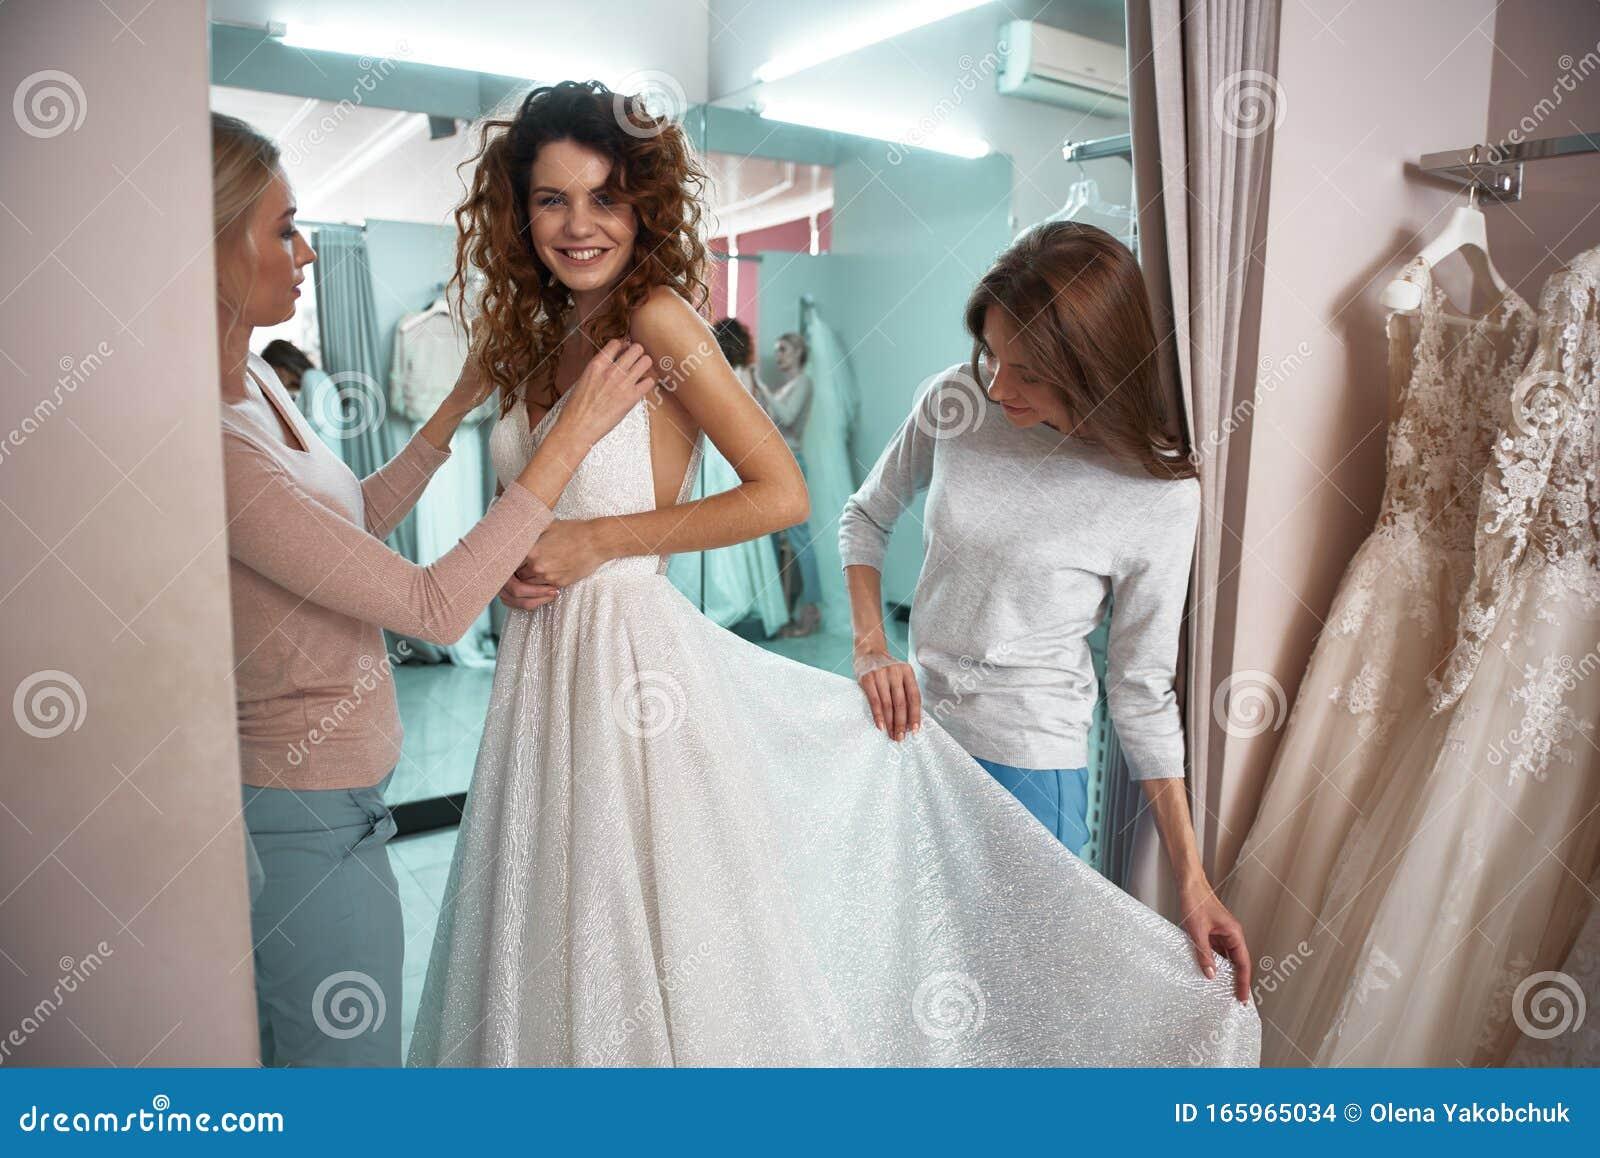 Happy Bride Trying On Dress In Wedding Salon Stock Photo Image Of Cloth Room 165965034,Beach Flowy Sleeveless Beach Flowy Wedding Dresses